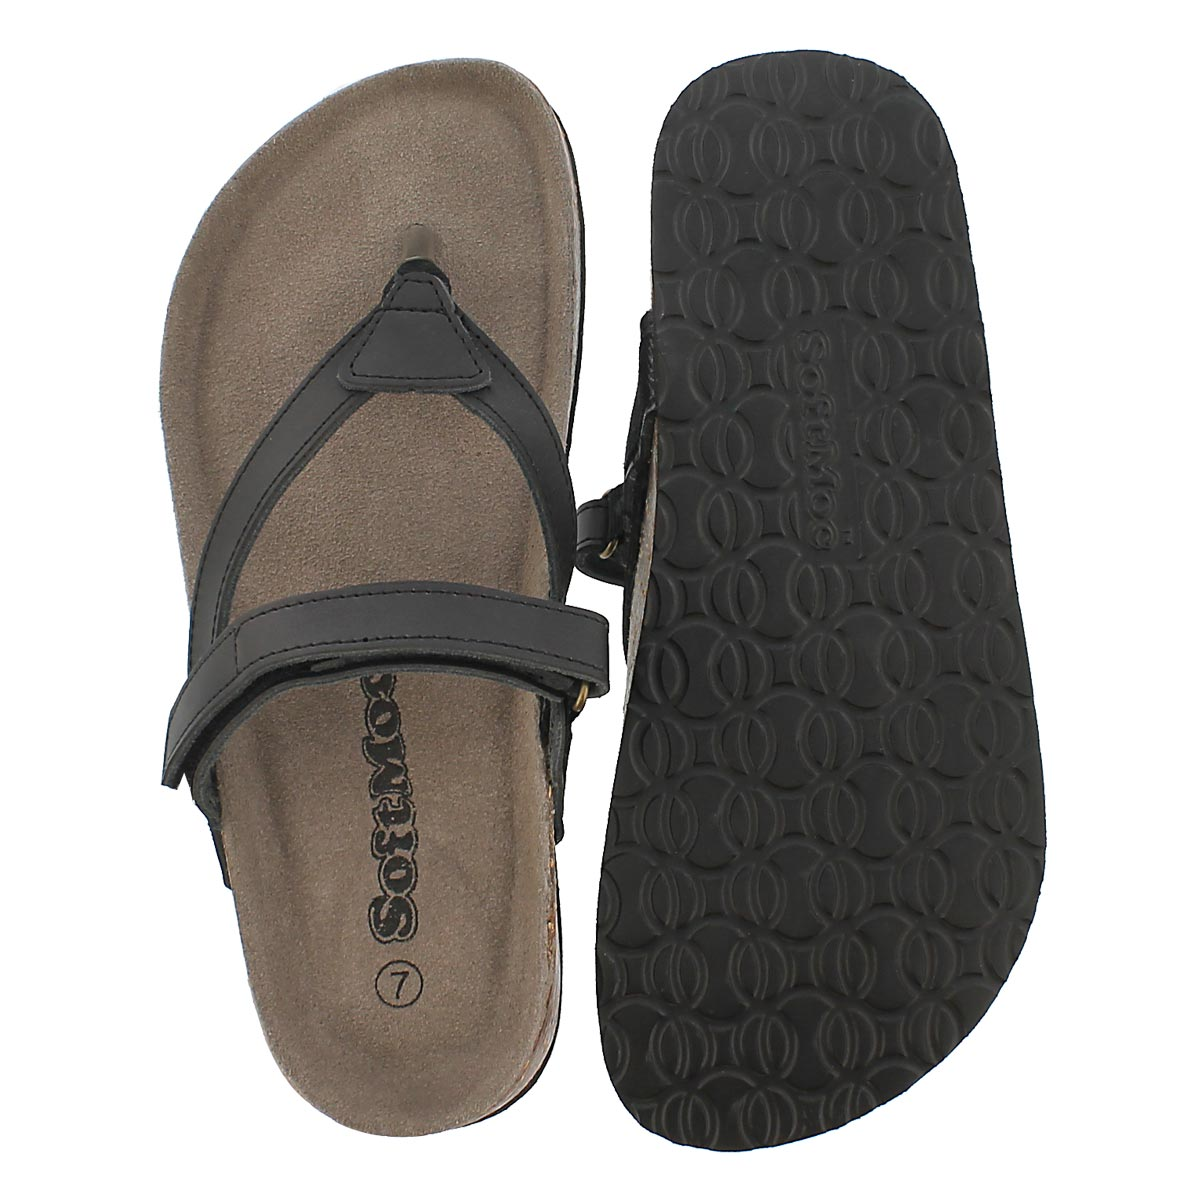 Lds Aisha black memory foam sandal